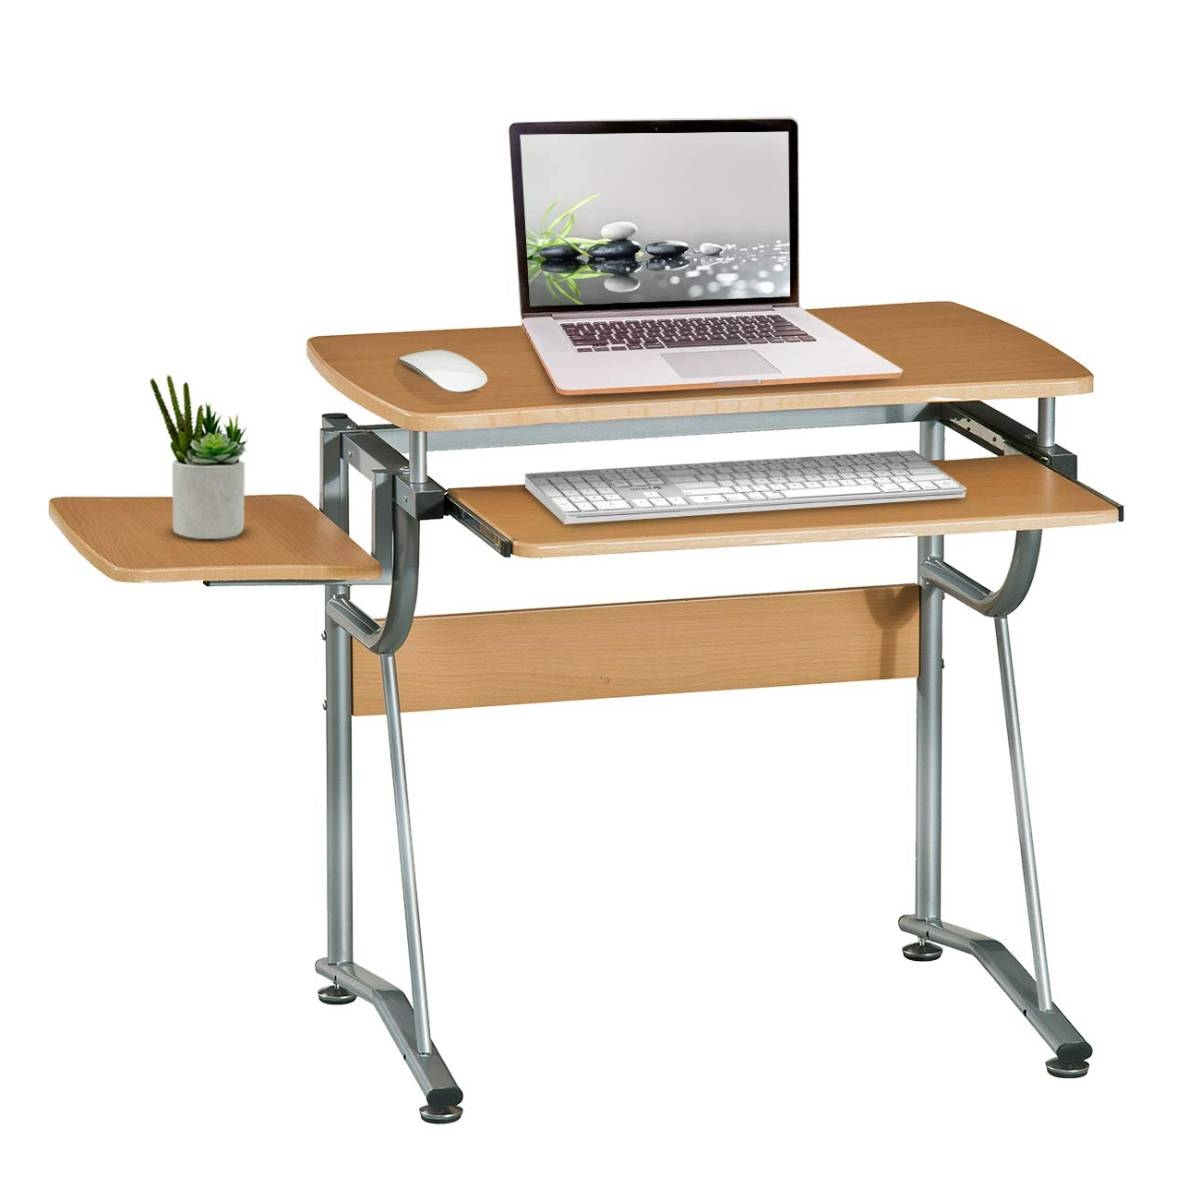 Compact Contemporary Computer Desk in Light Cherry Finish